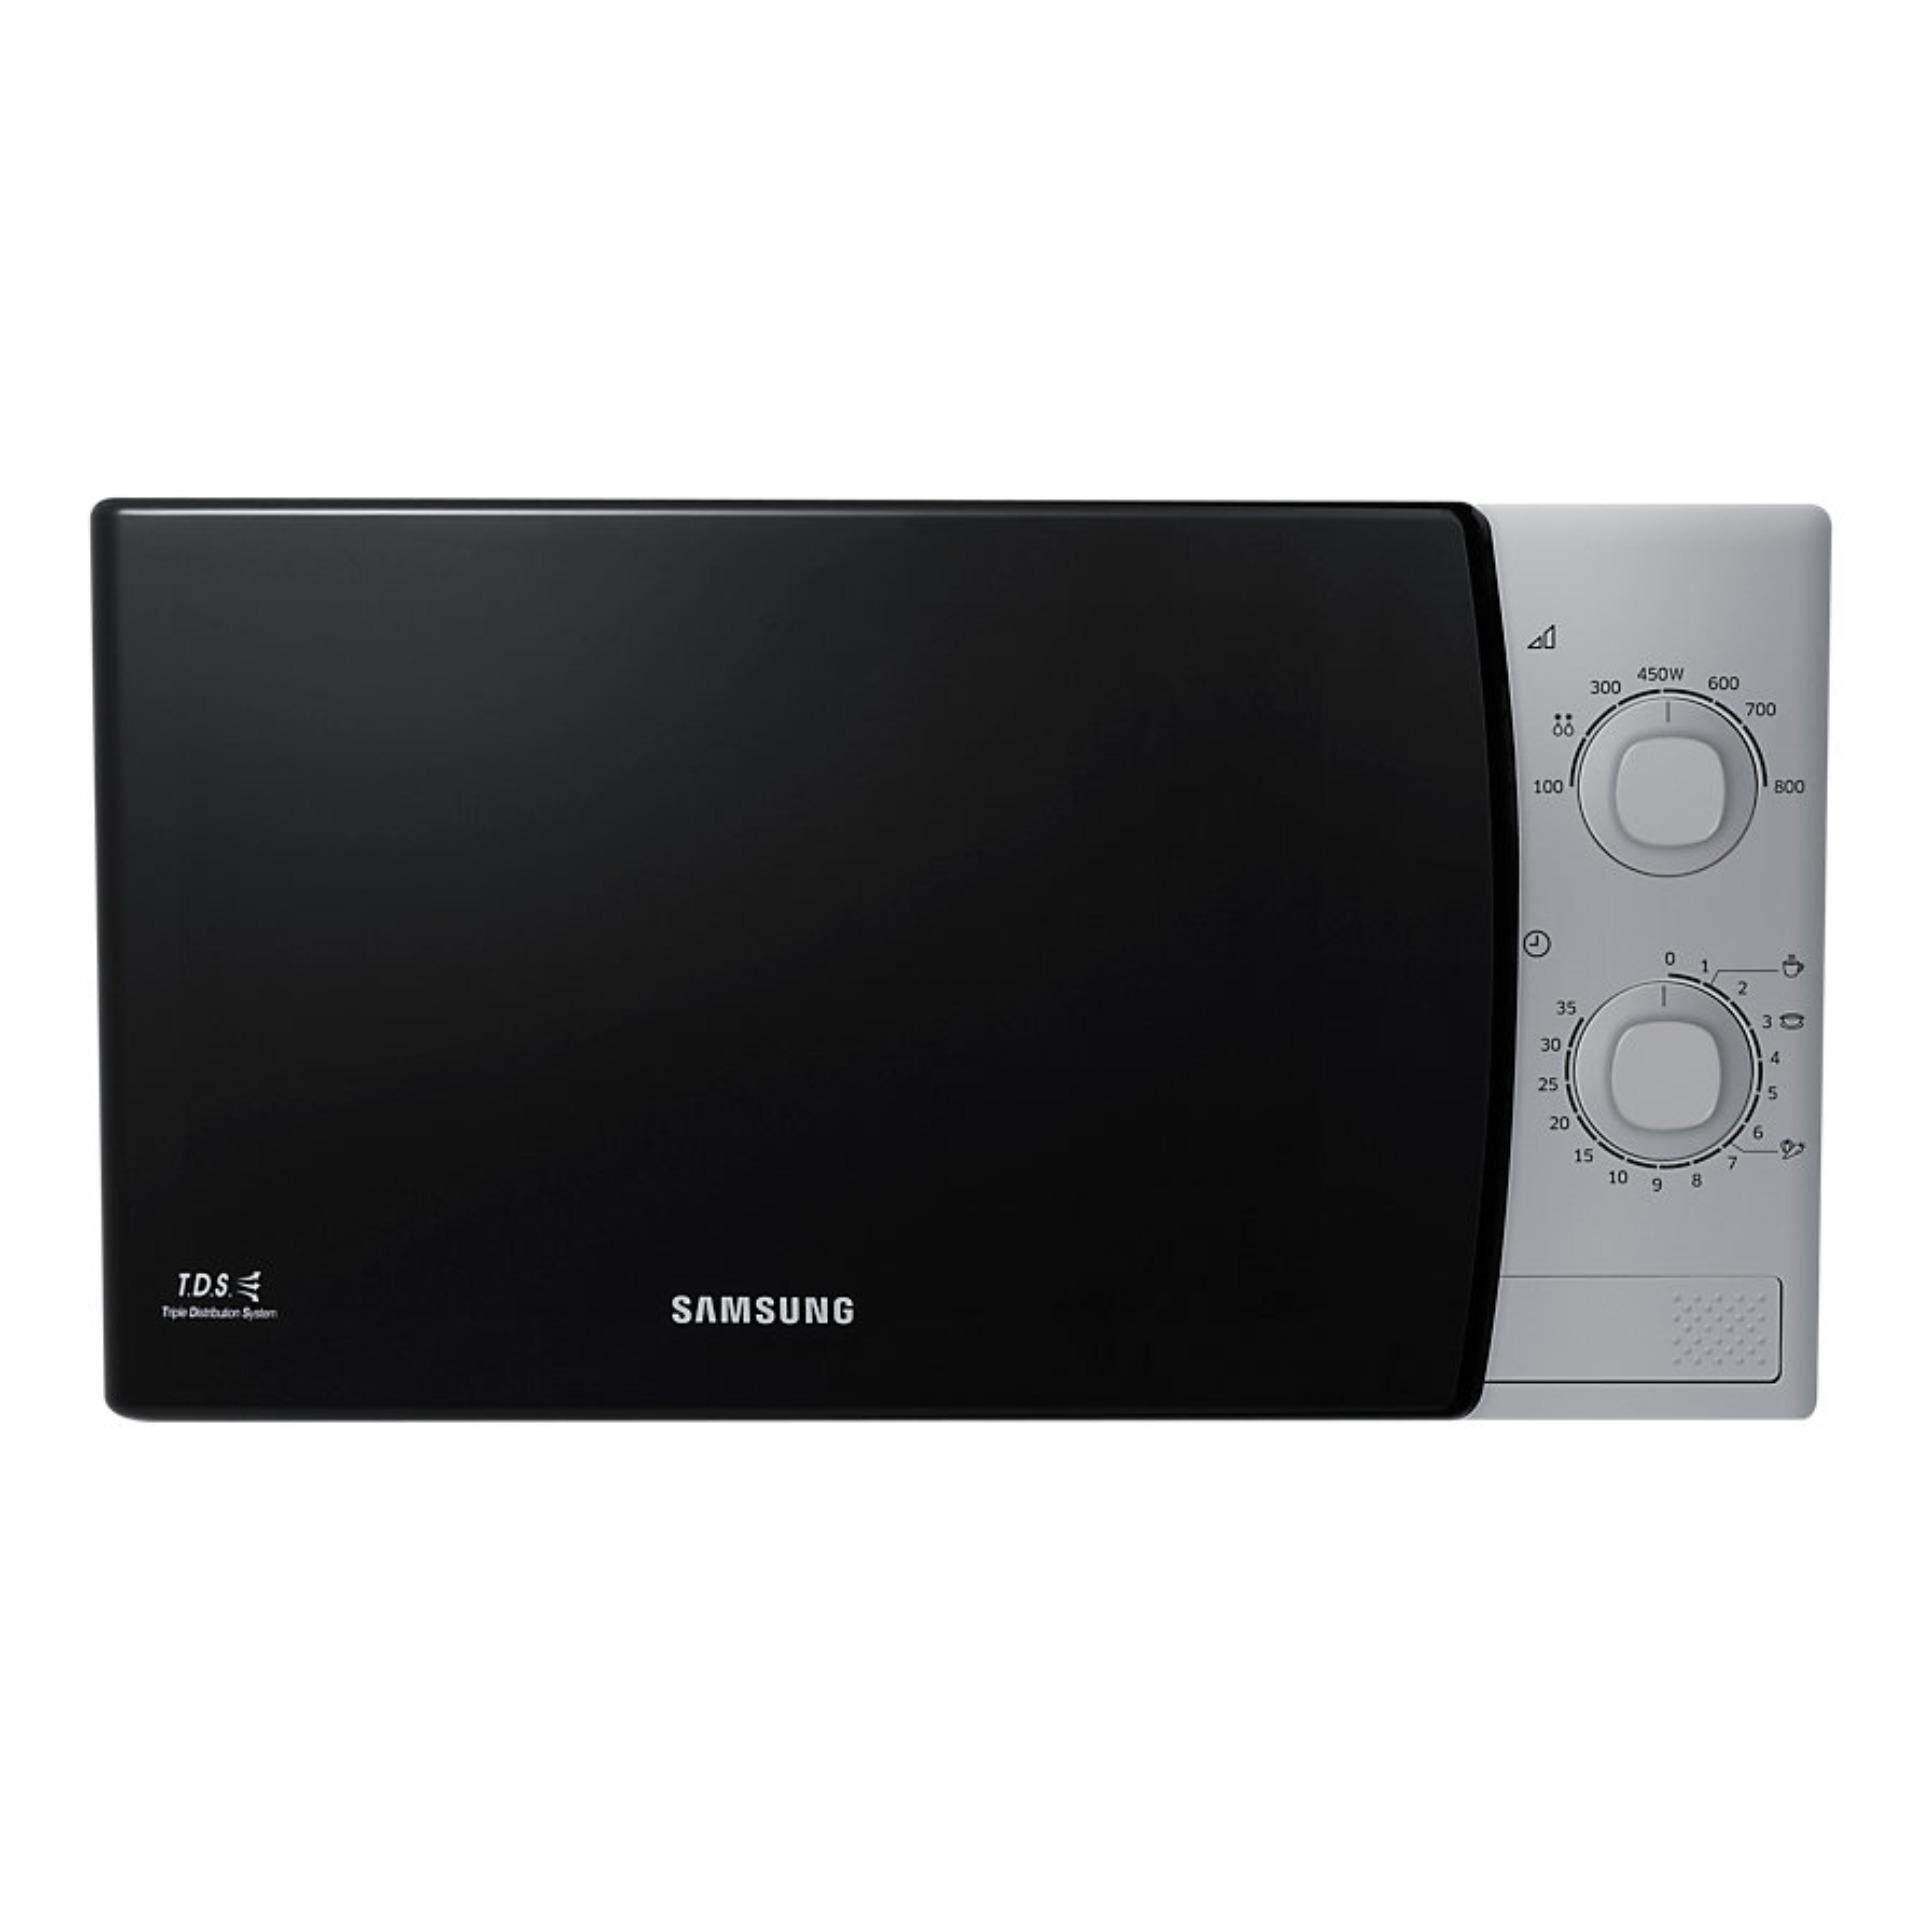 Samsung เตาอบไมโครเวฟ ความจุ 23 ลิตร รุ่น ME81KS-1/ST  - d77e1b52b6756ed298cd45b7b753c87f - Klass Oven หม้ออบลมร้อน